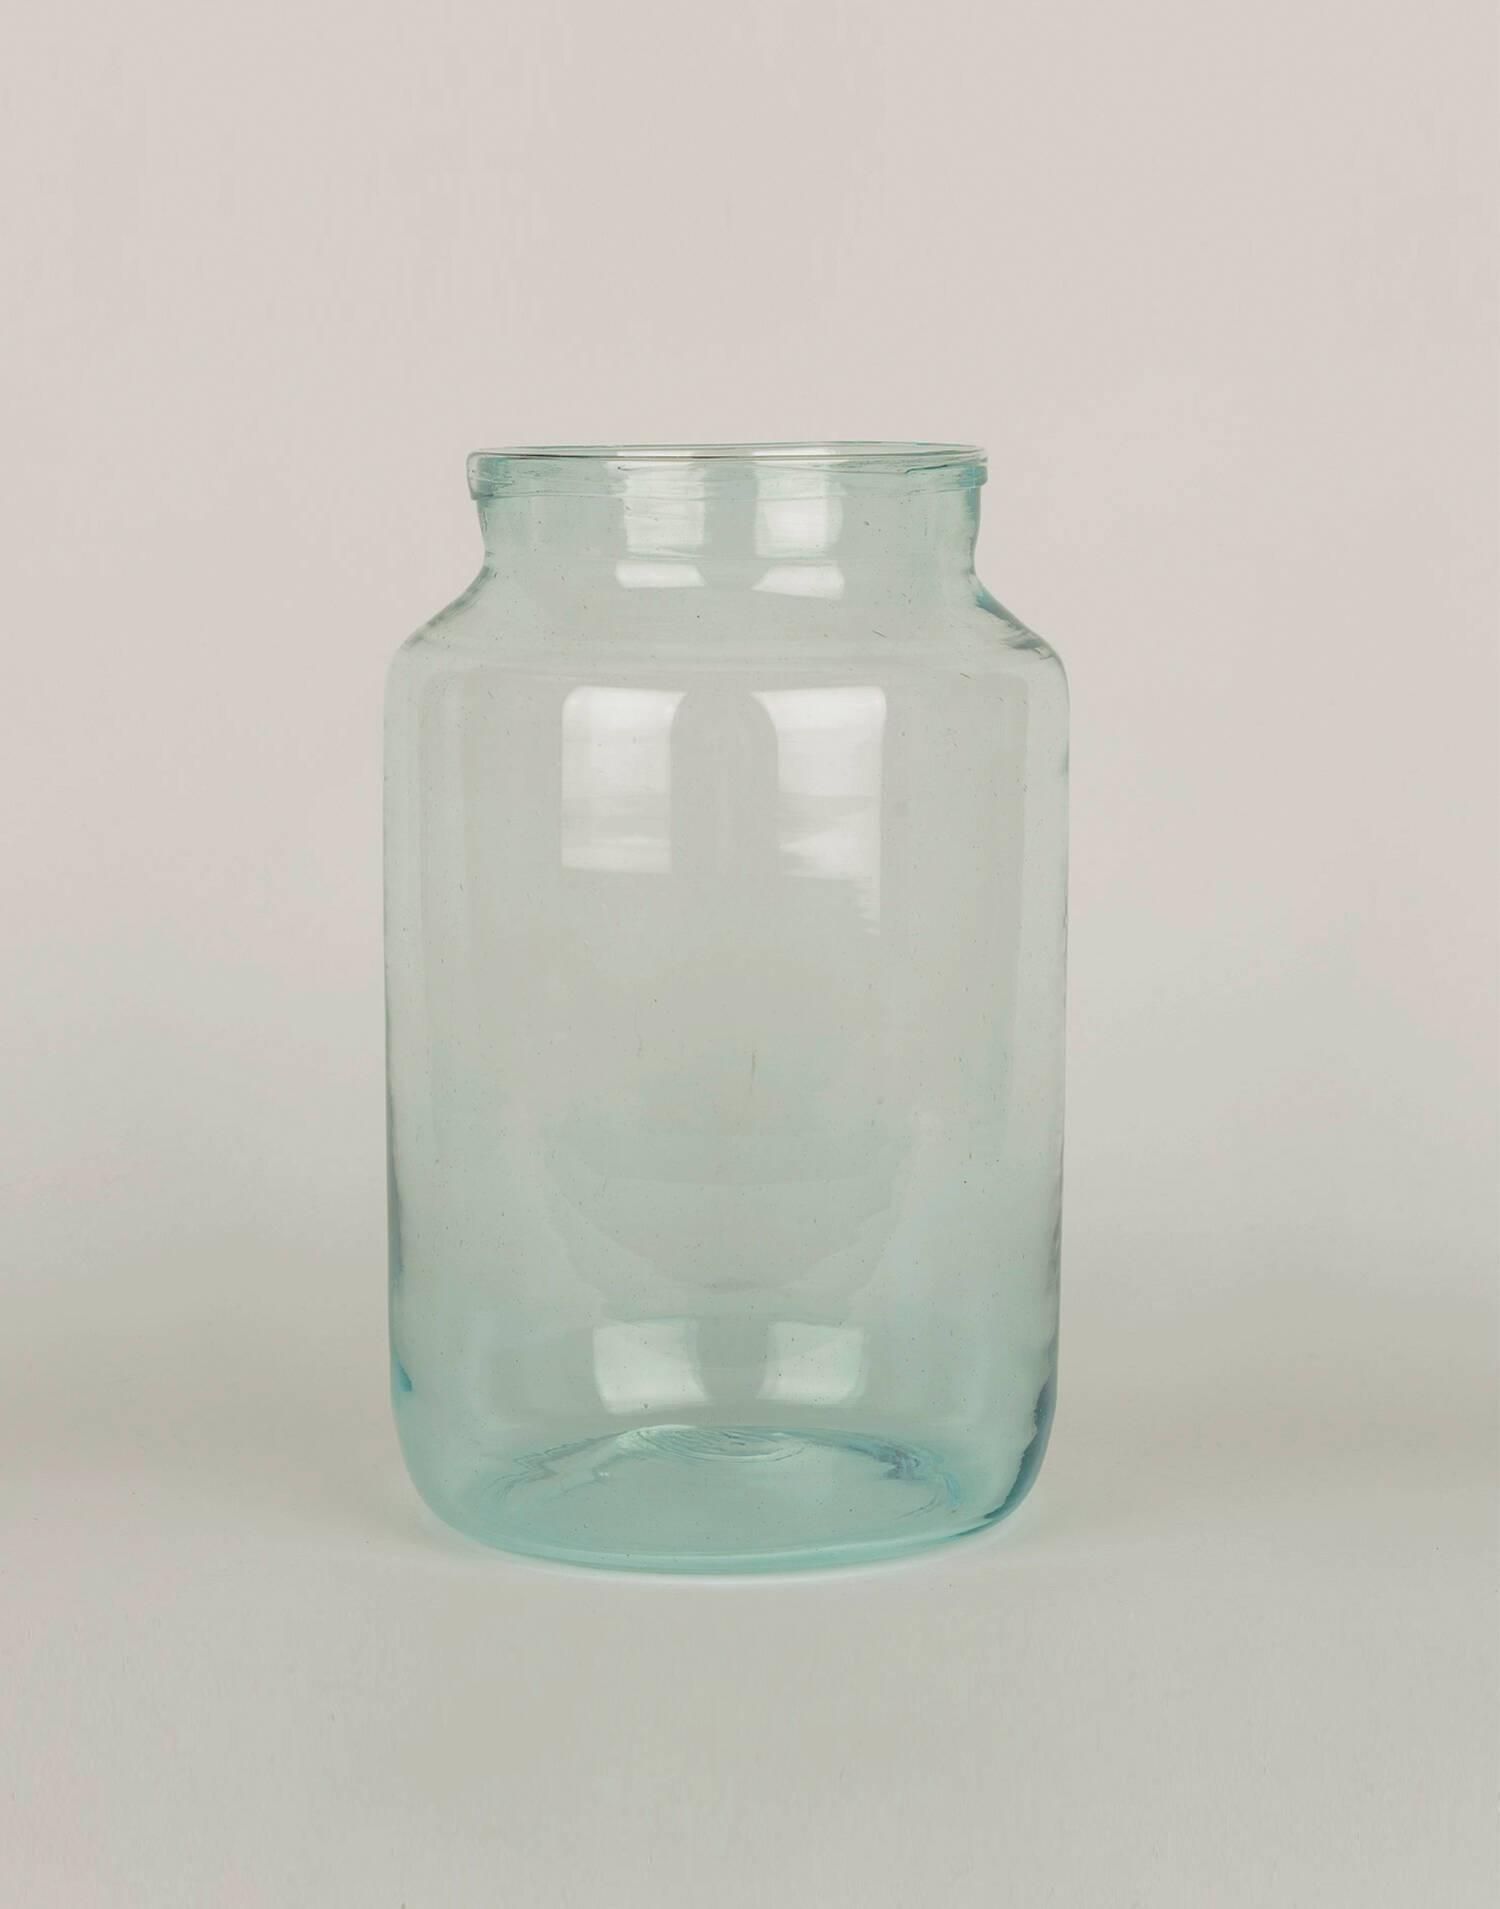 Vaso vetro spesso 18 x 30cm